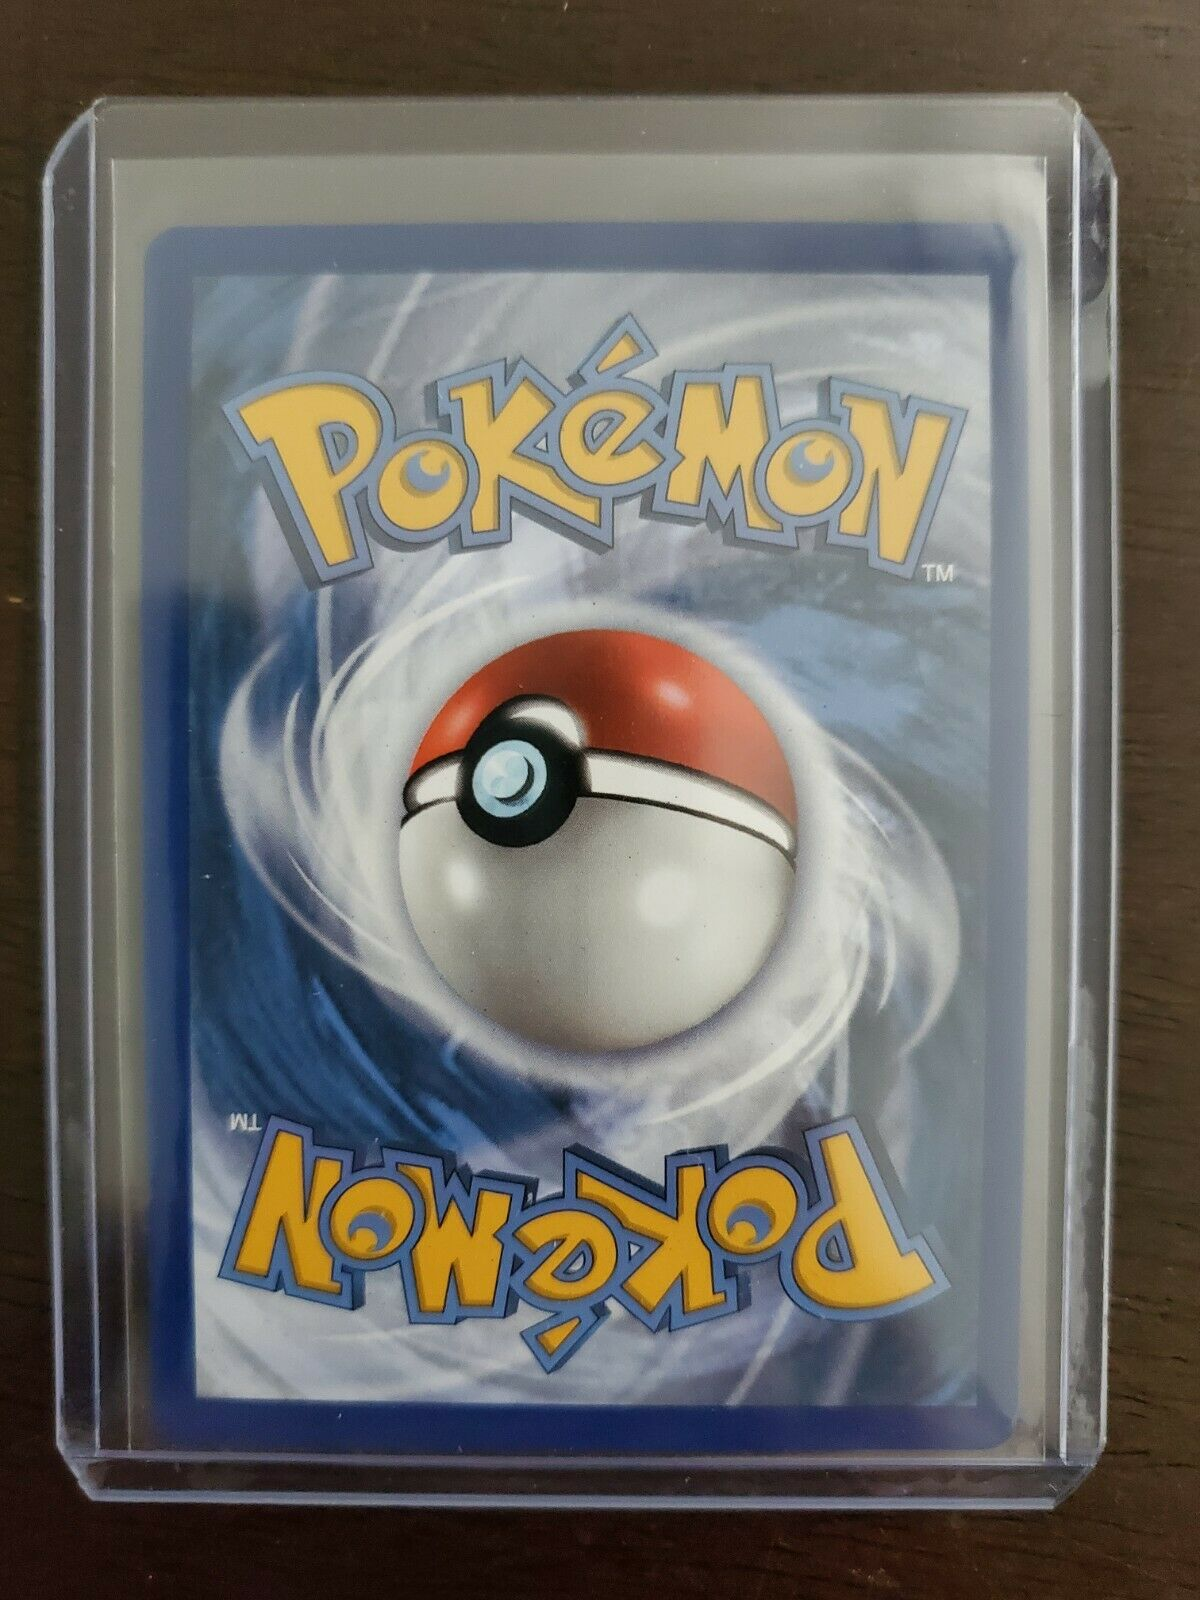 Pokemon TCG: Chilling Reign - Galarian Articuno V 058/198 - Ultra Rare NM Fresh - Image 2